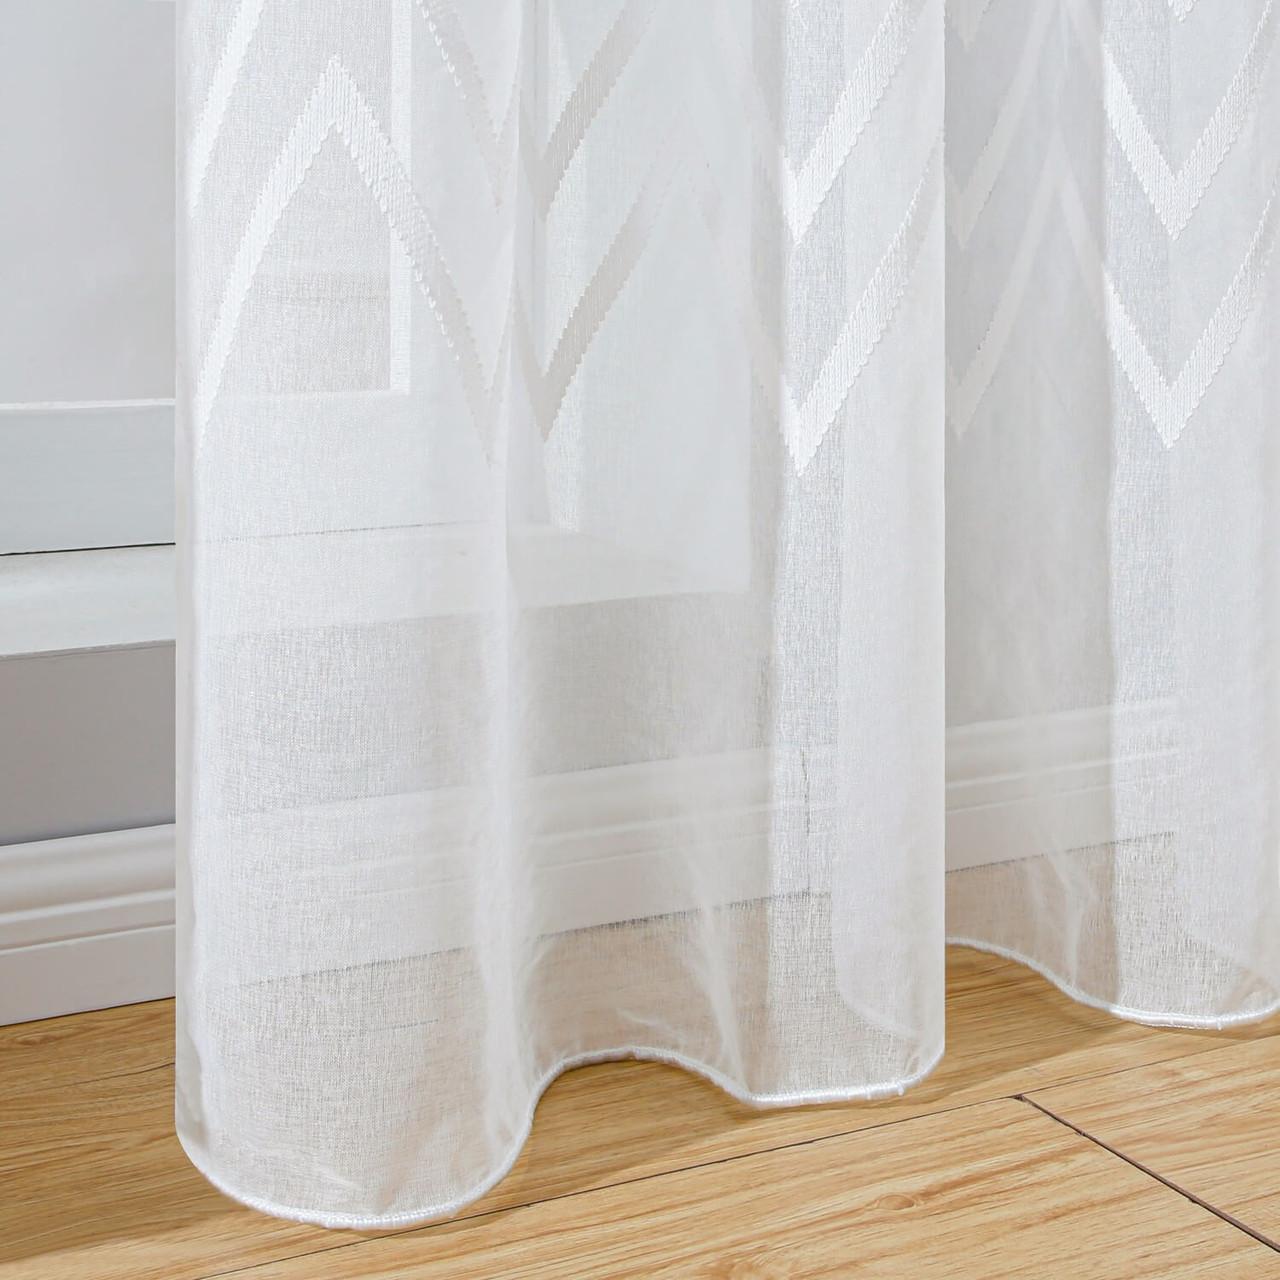 Sheer Curtain Panel Window Treatments DMC727 Dolce Mela 8171460151914